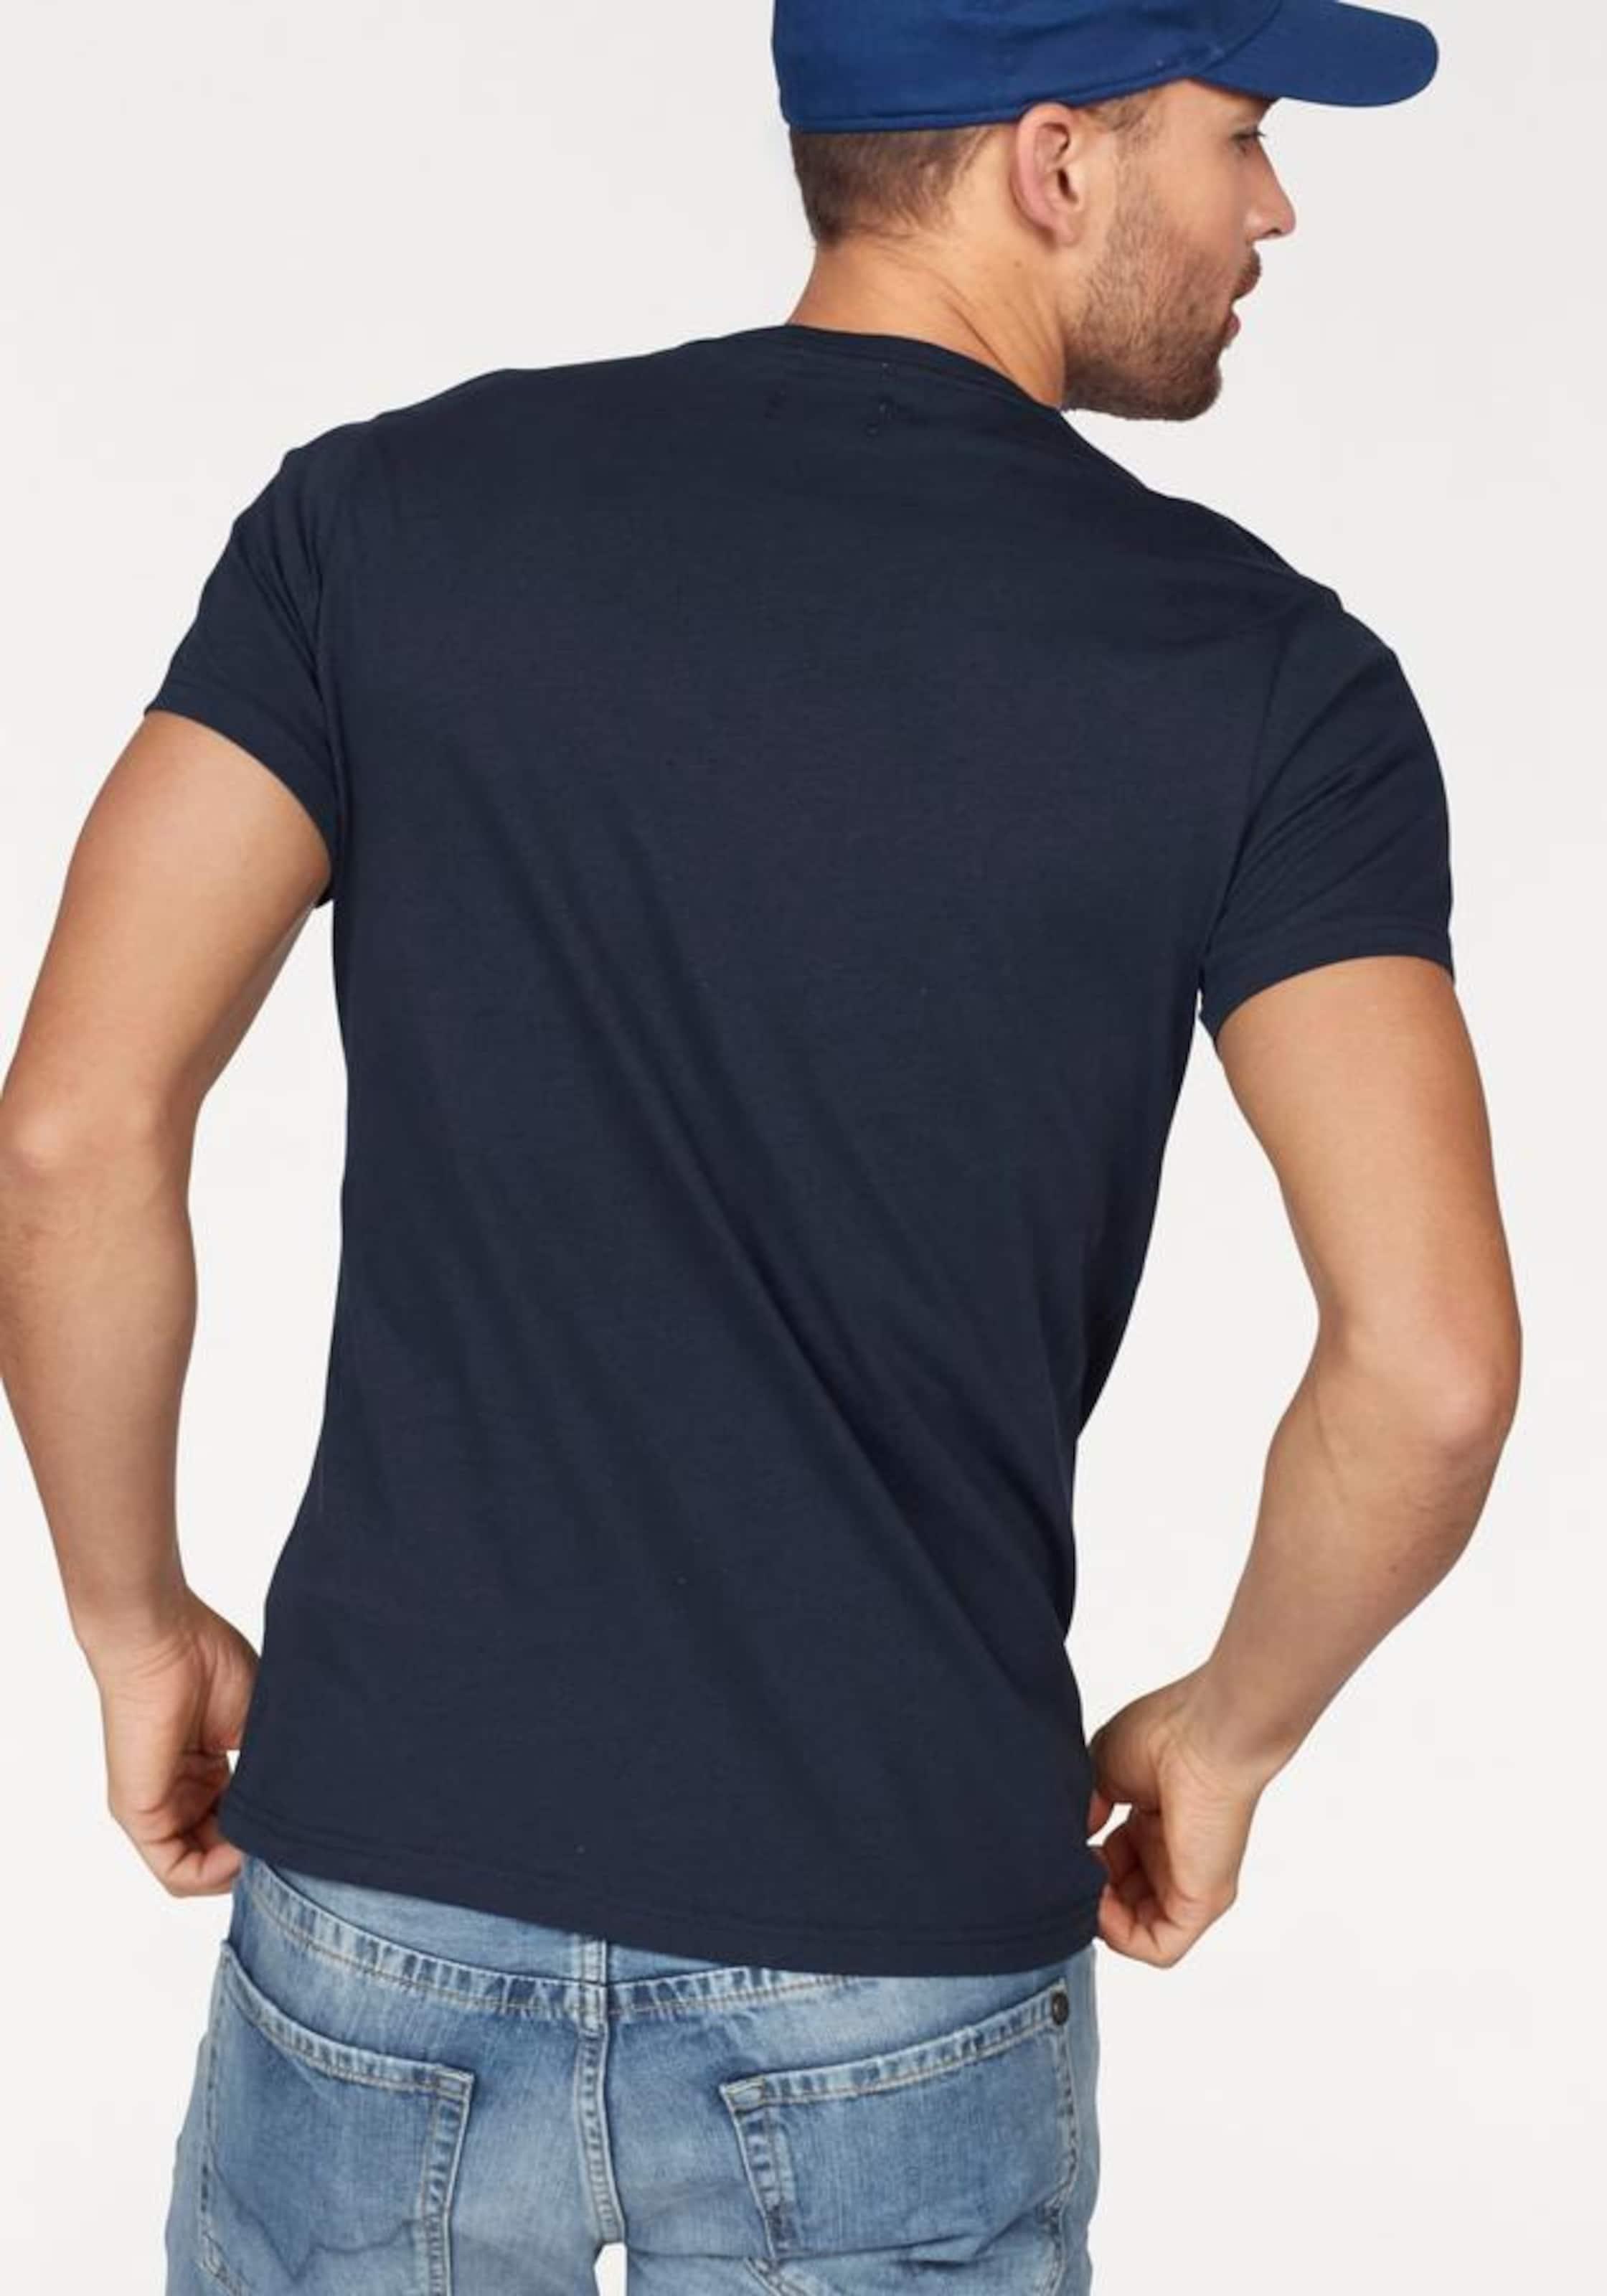 Zum Verkauf Online-Shop Auslass Eastbay Pepe Jeans Rundhalsshirt 'EGGO' Billig Verkauf Footlocker Finish Drop-Shipping Rabatt Neue Stile 4dsdkDHkMb